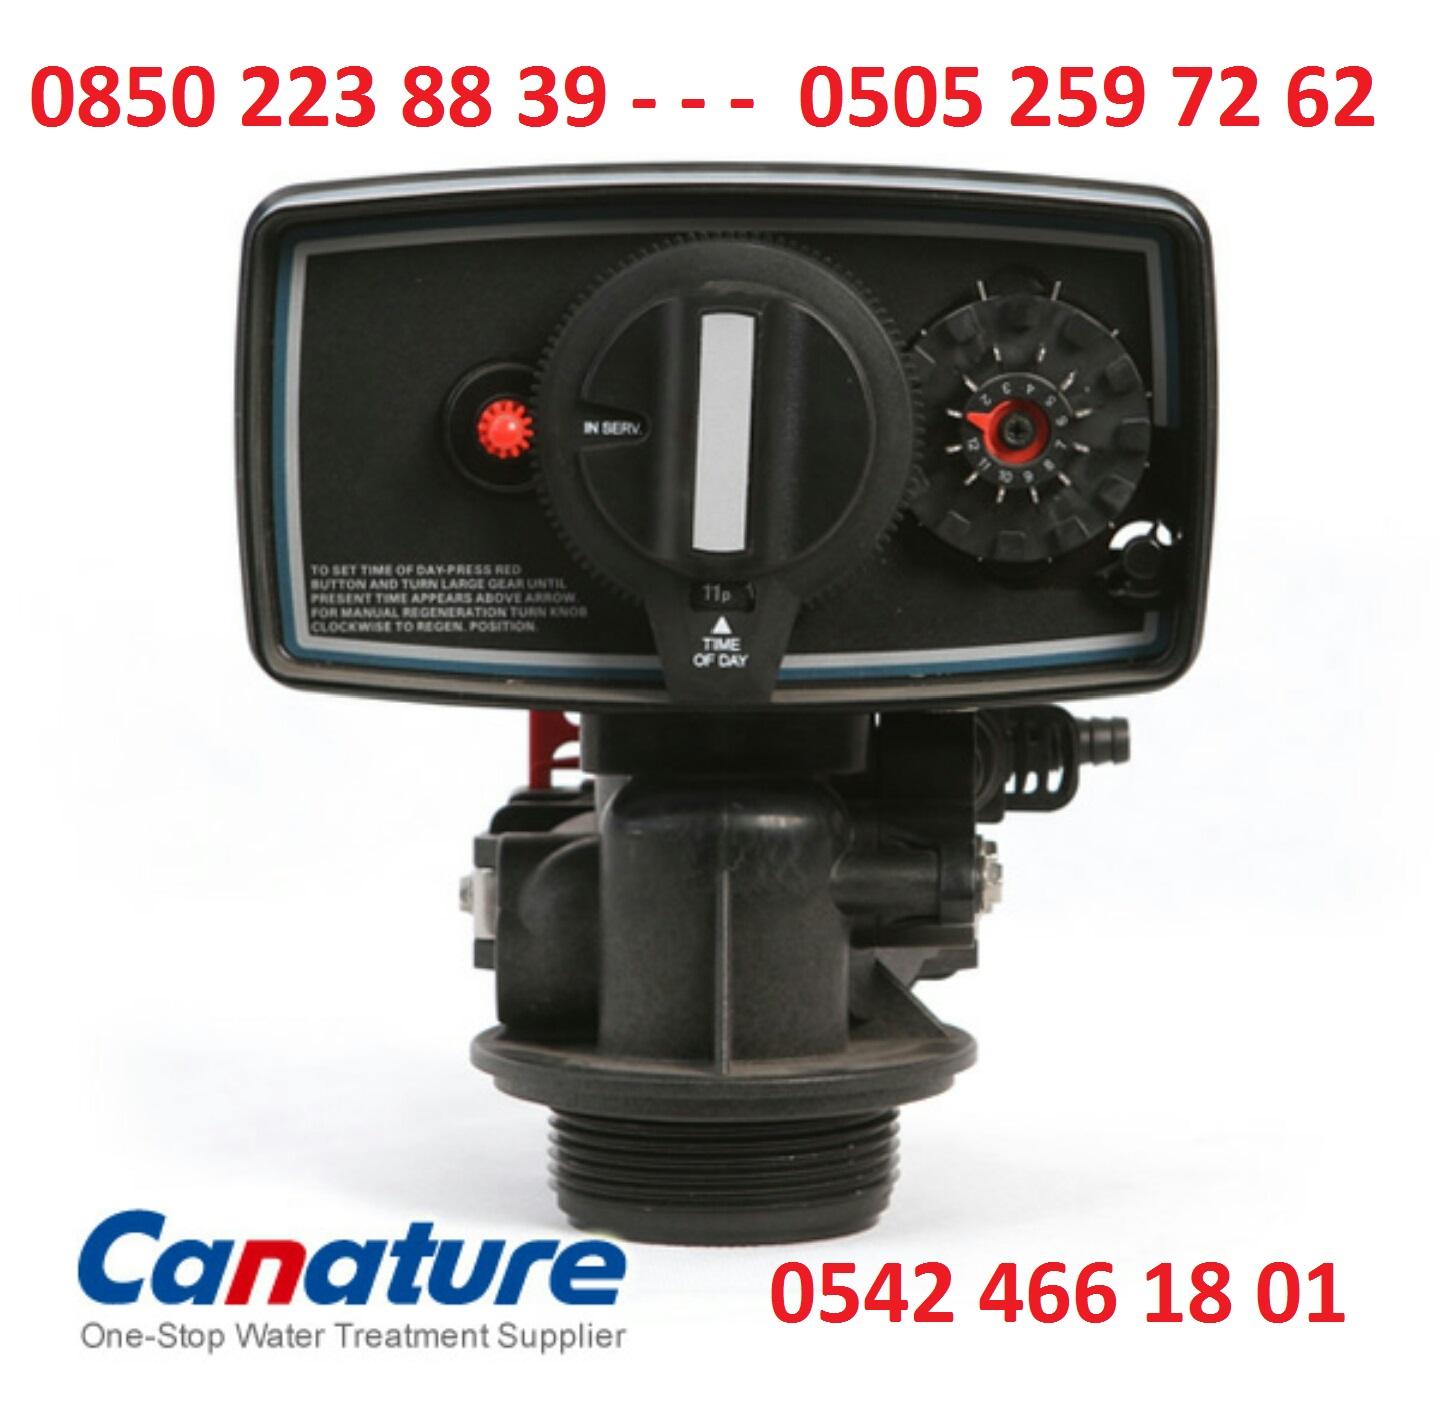 canature